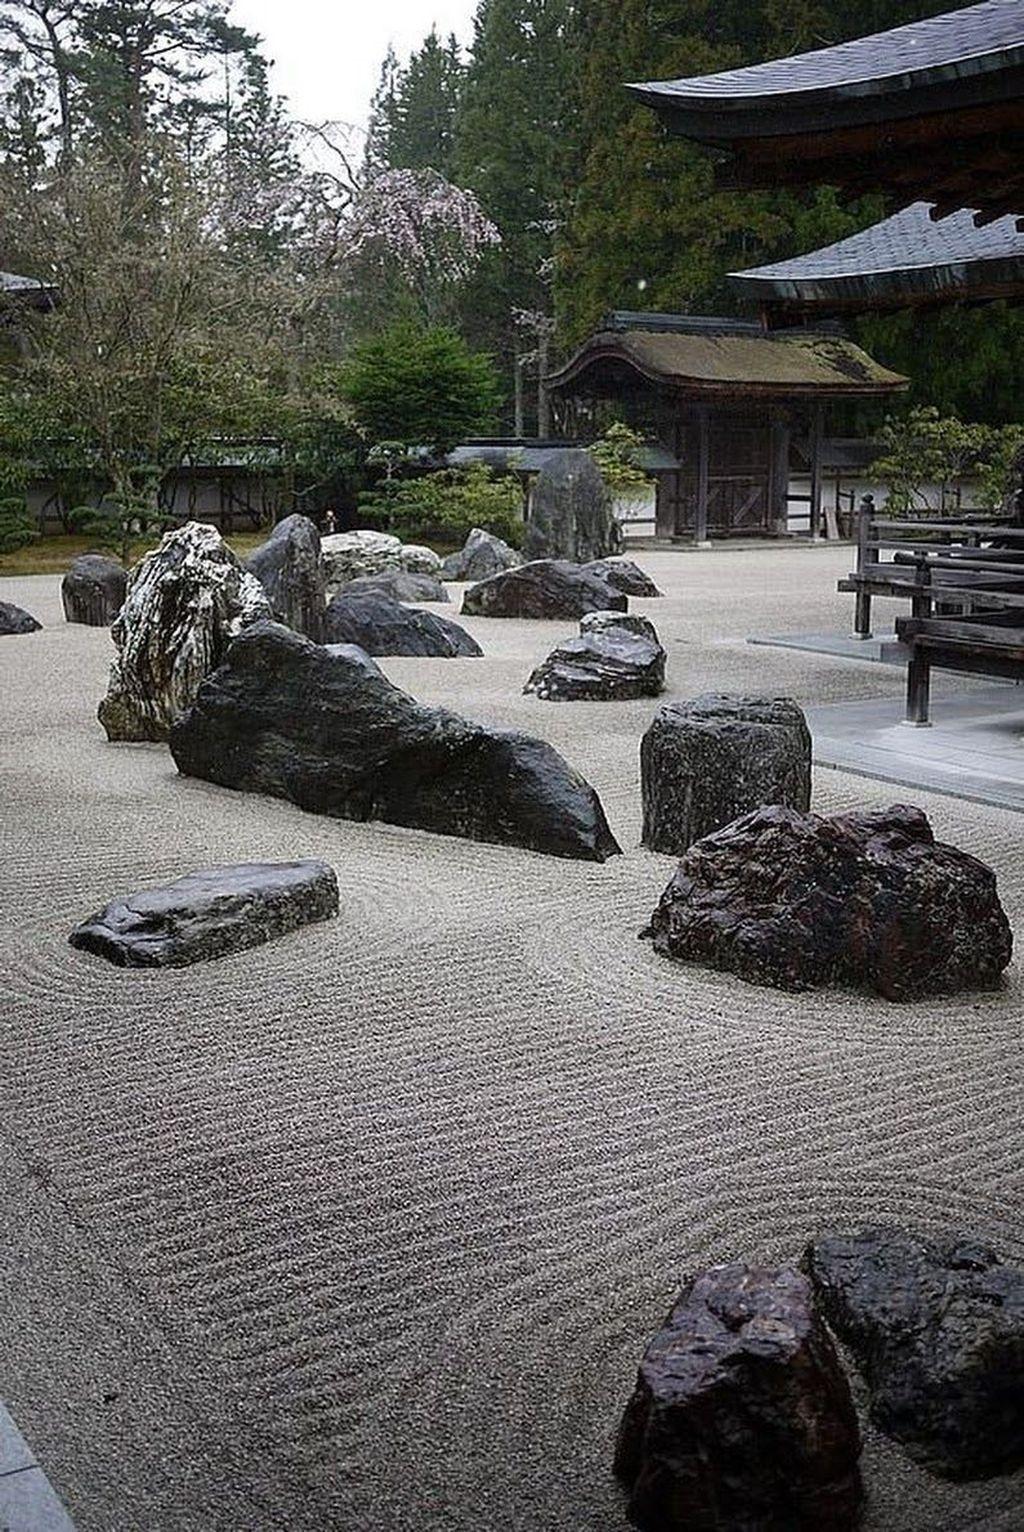 Pin By Fuorican On Landscaped Garden Rock Garden Design Rockery